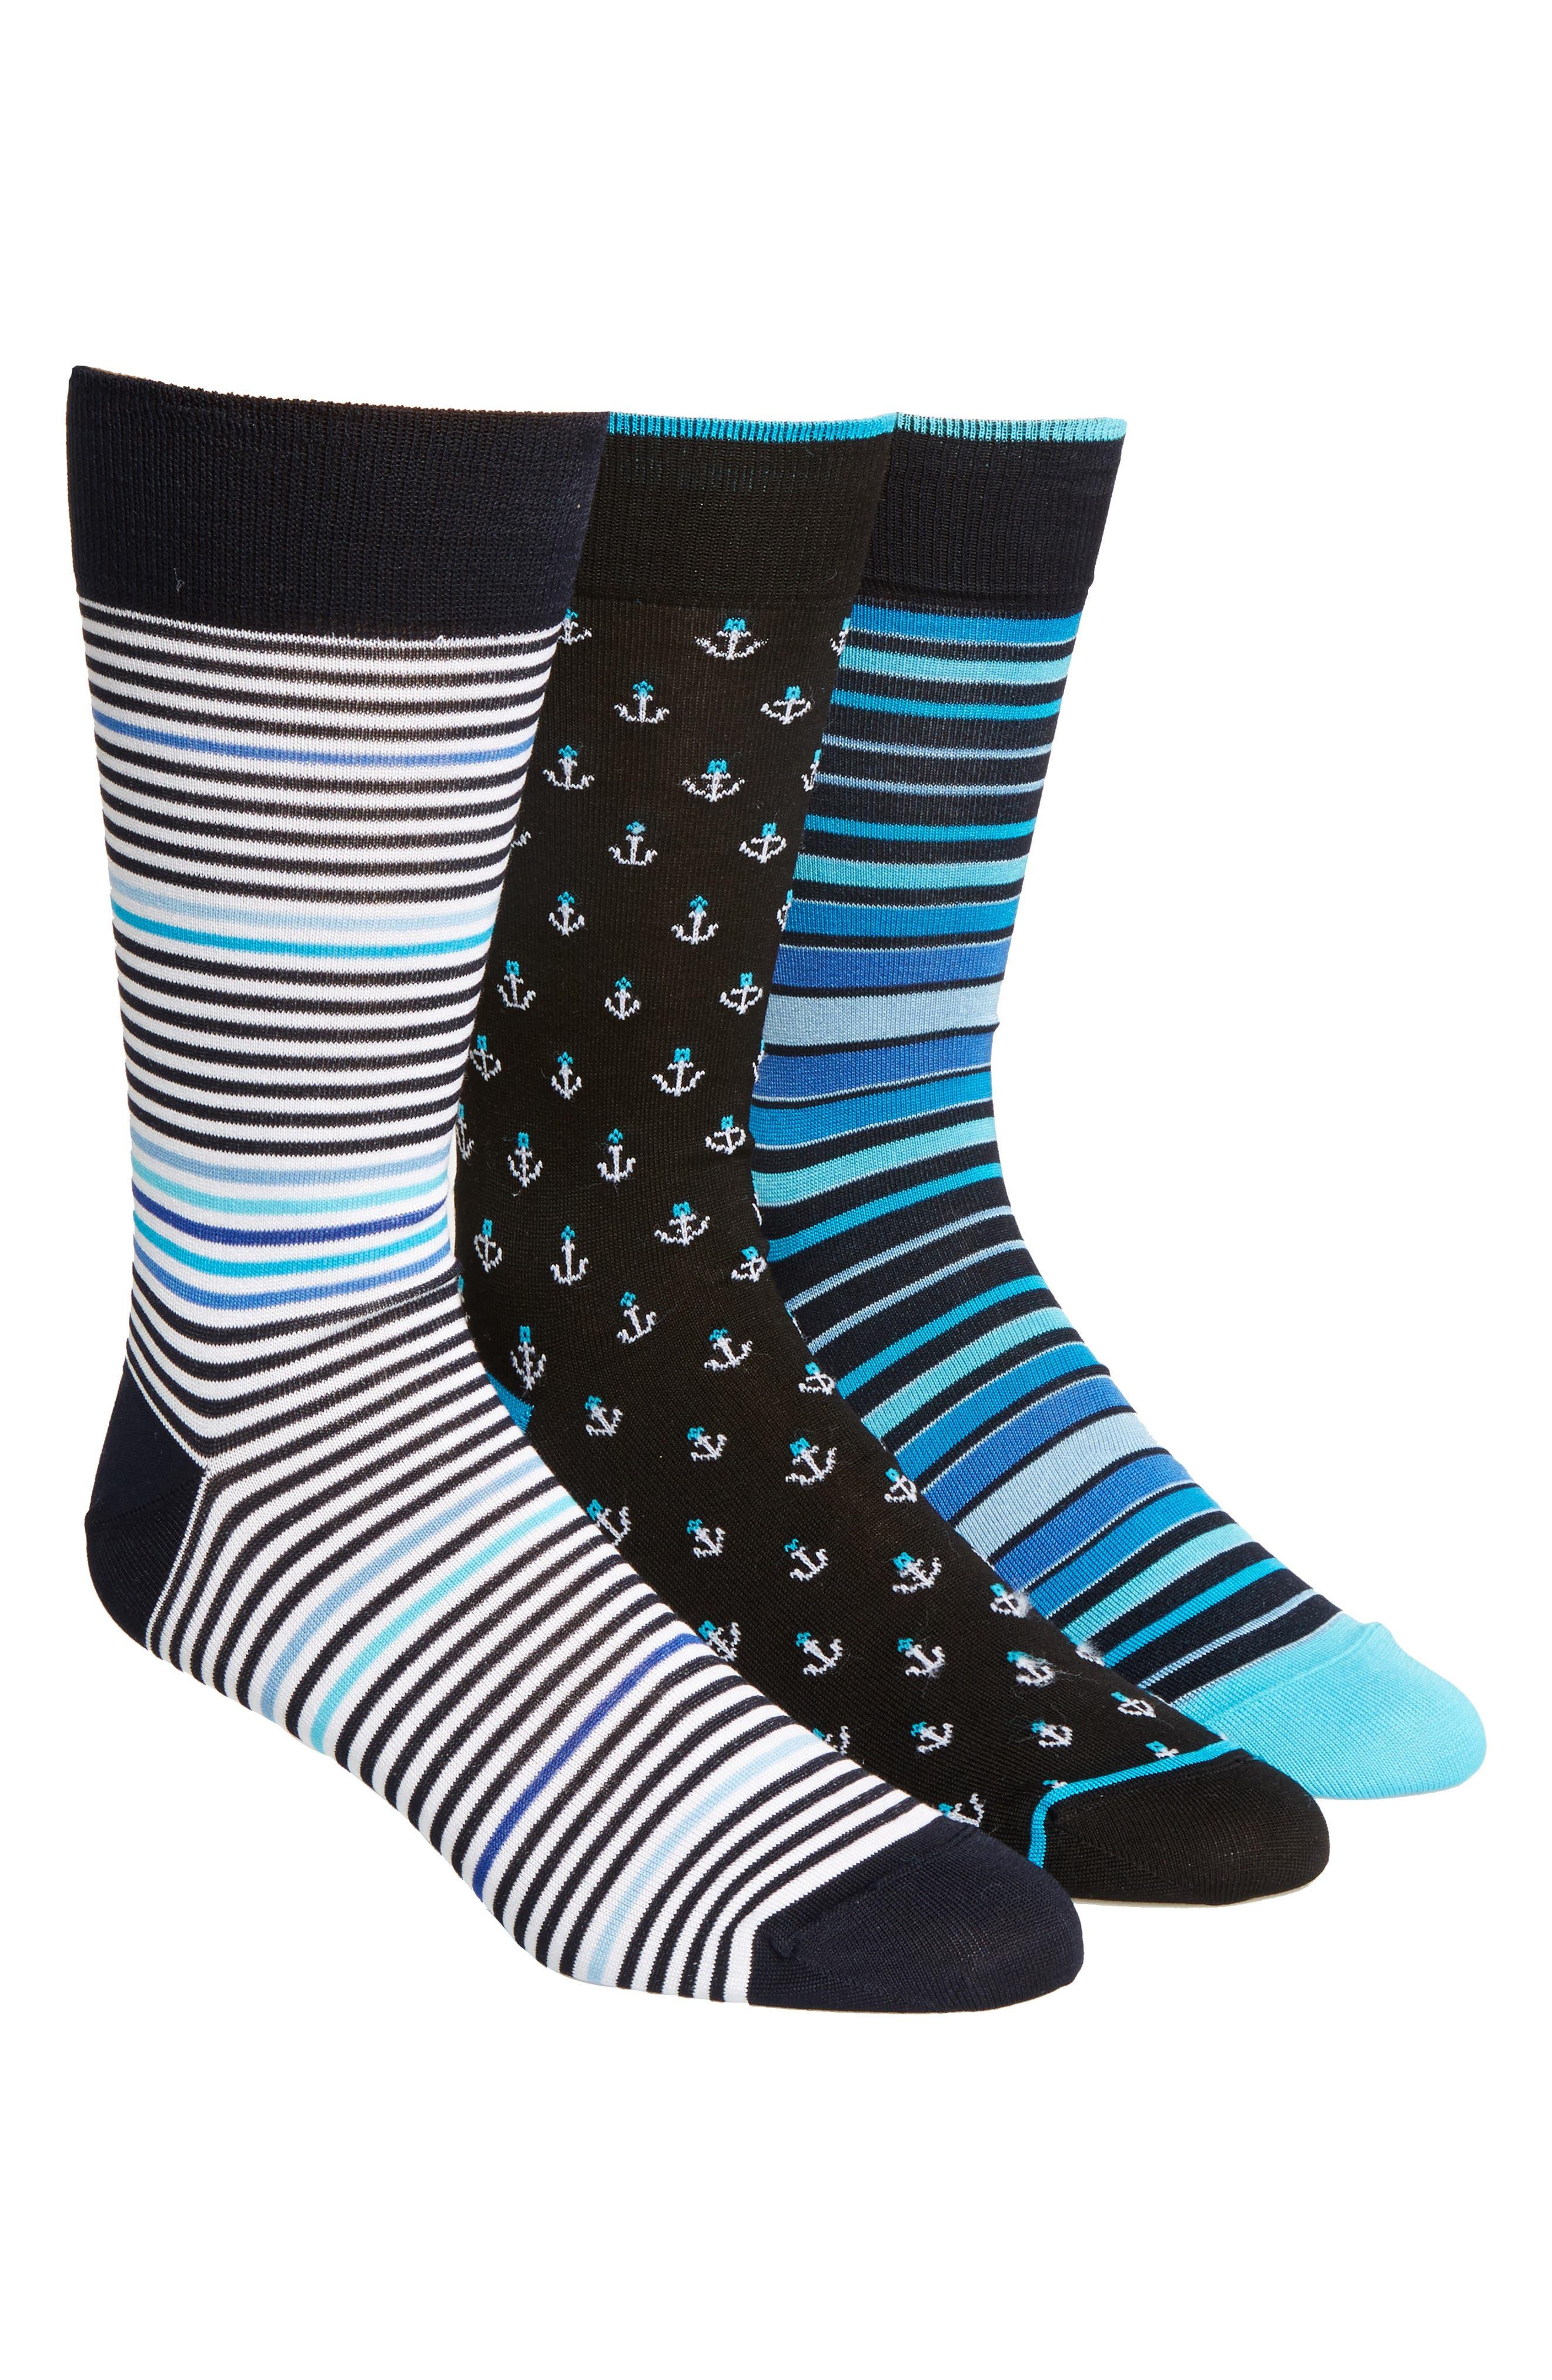 3-Pack Cotton Blend Socks,                             Main thumbnail 1, color,                             410